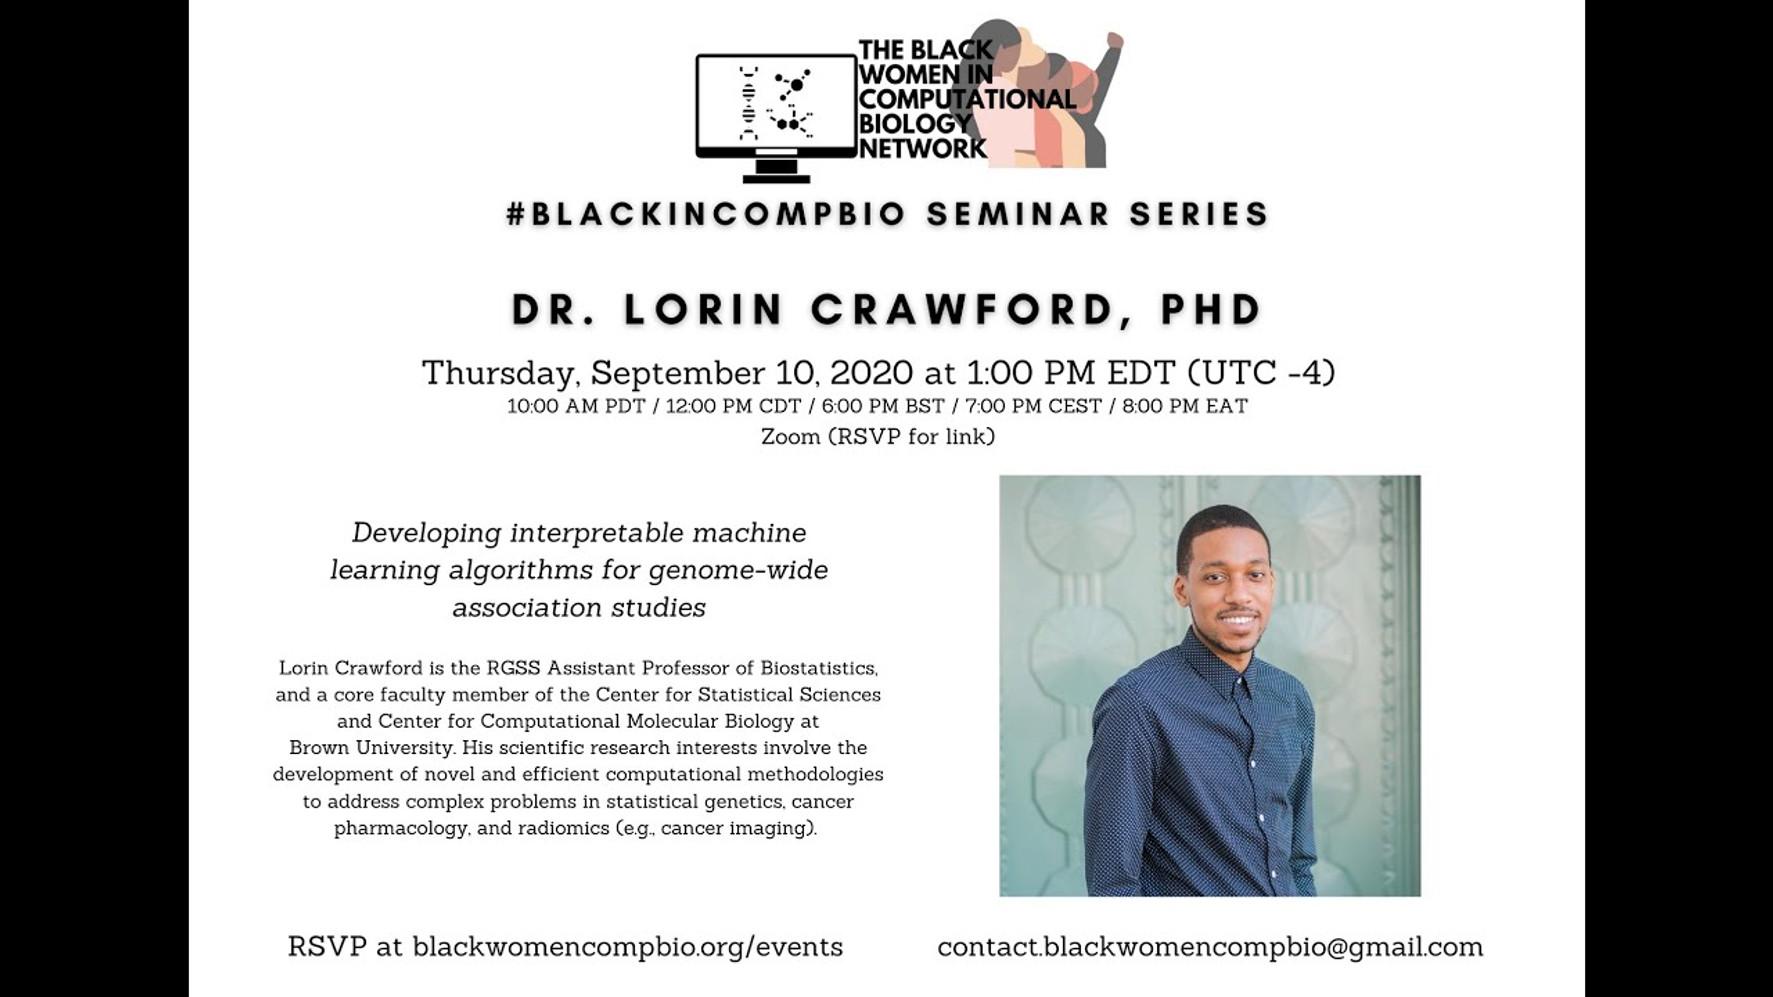 Lorin Crawford, Ph.D. (Brown University)